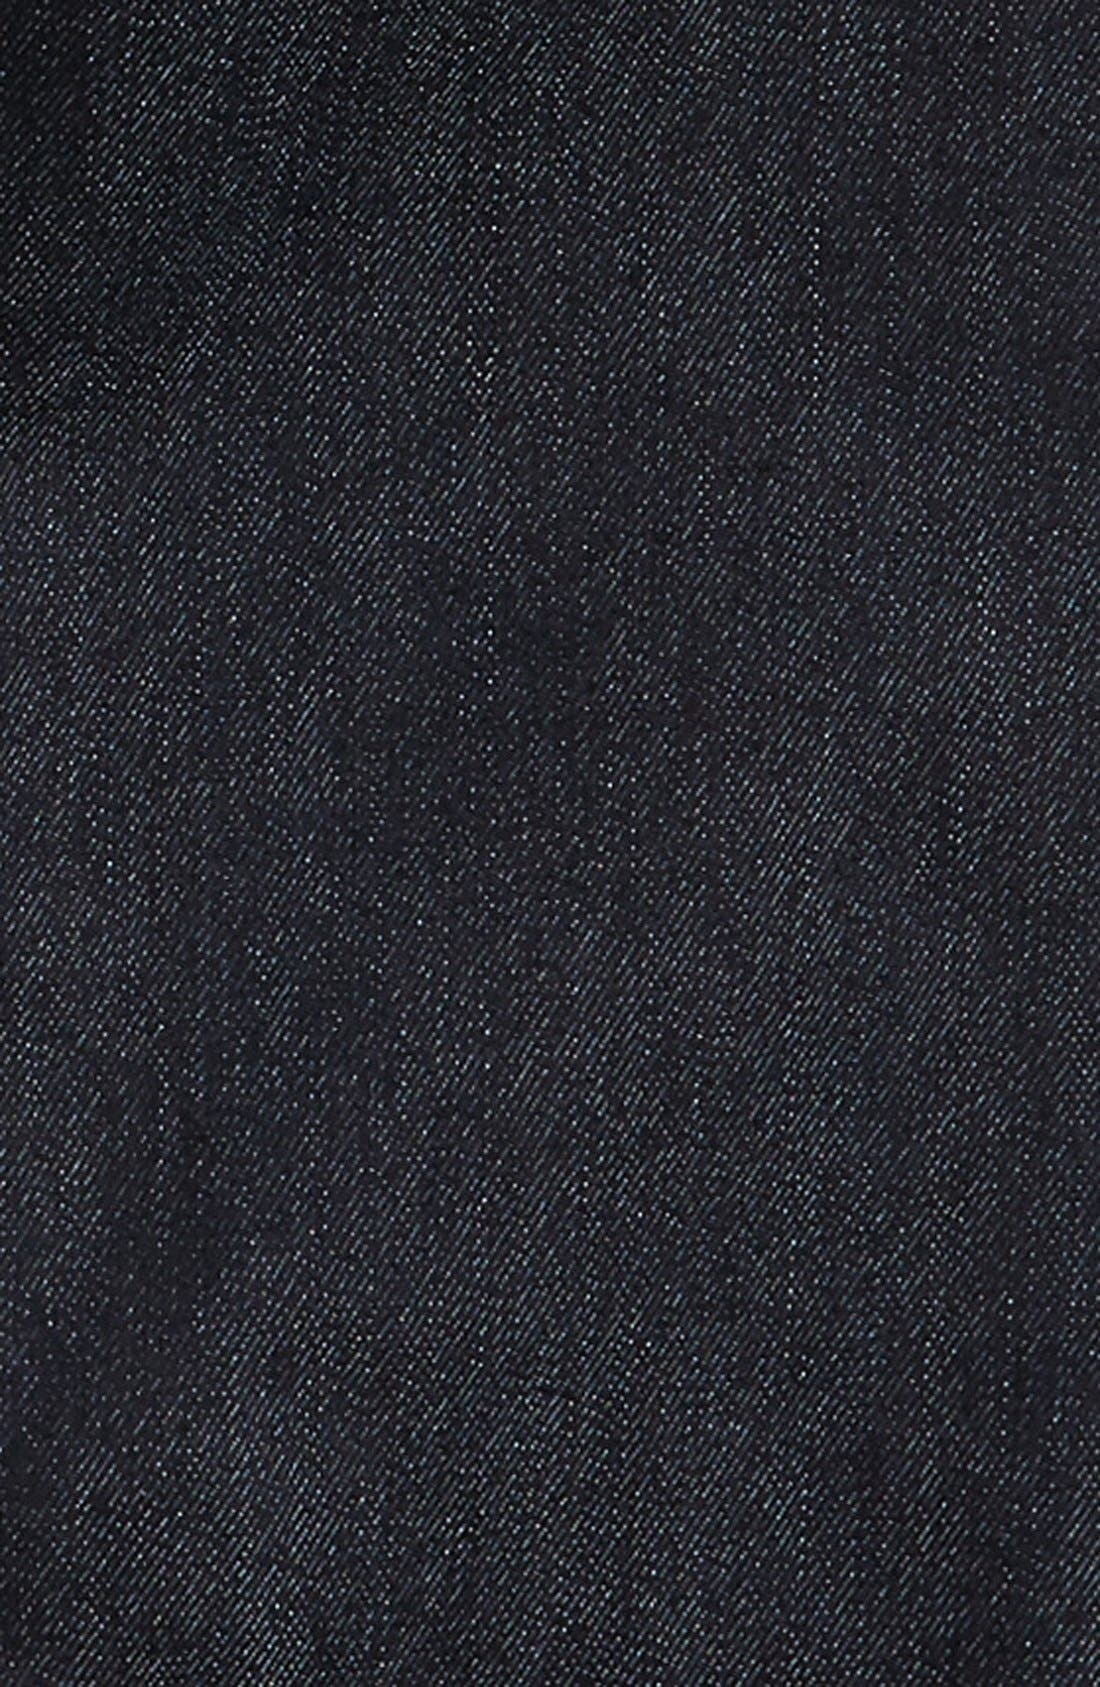 Brixton Straight Leg Jeans,                             Alternate thumbnail 5, color,                             400